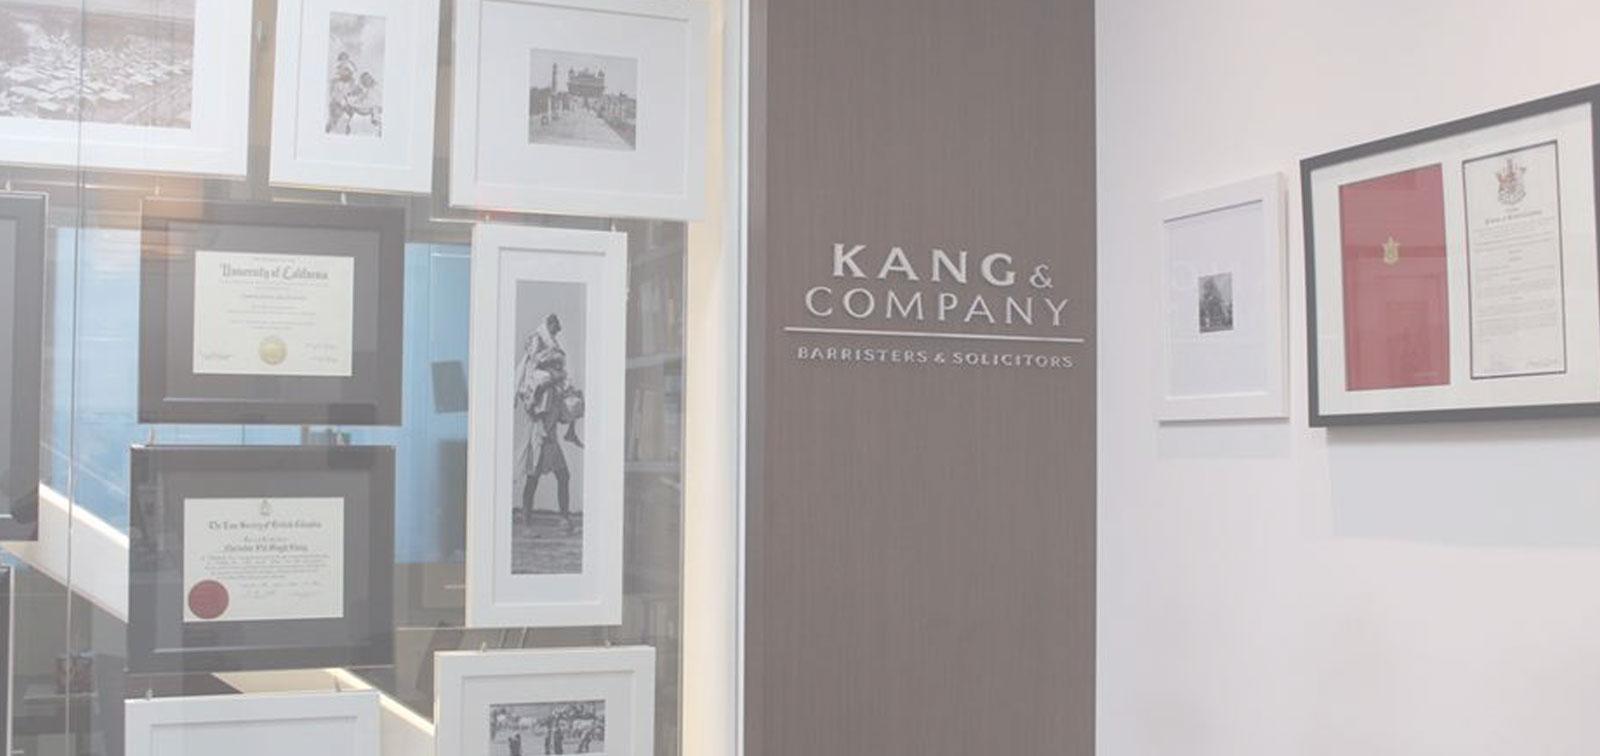 Kang & Company